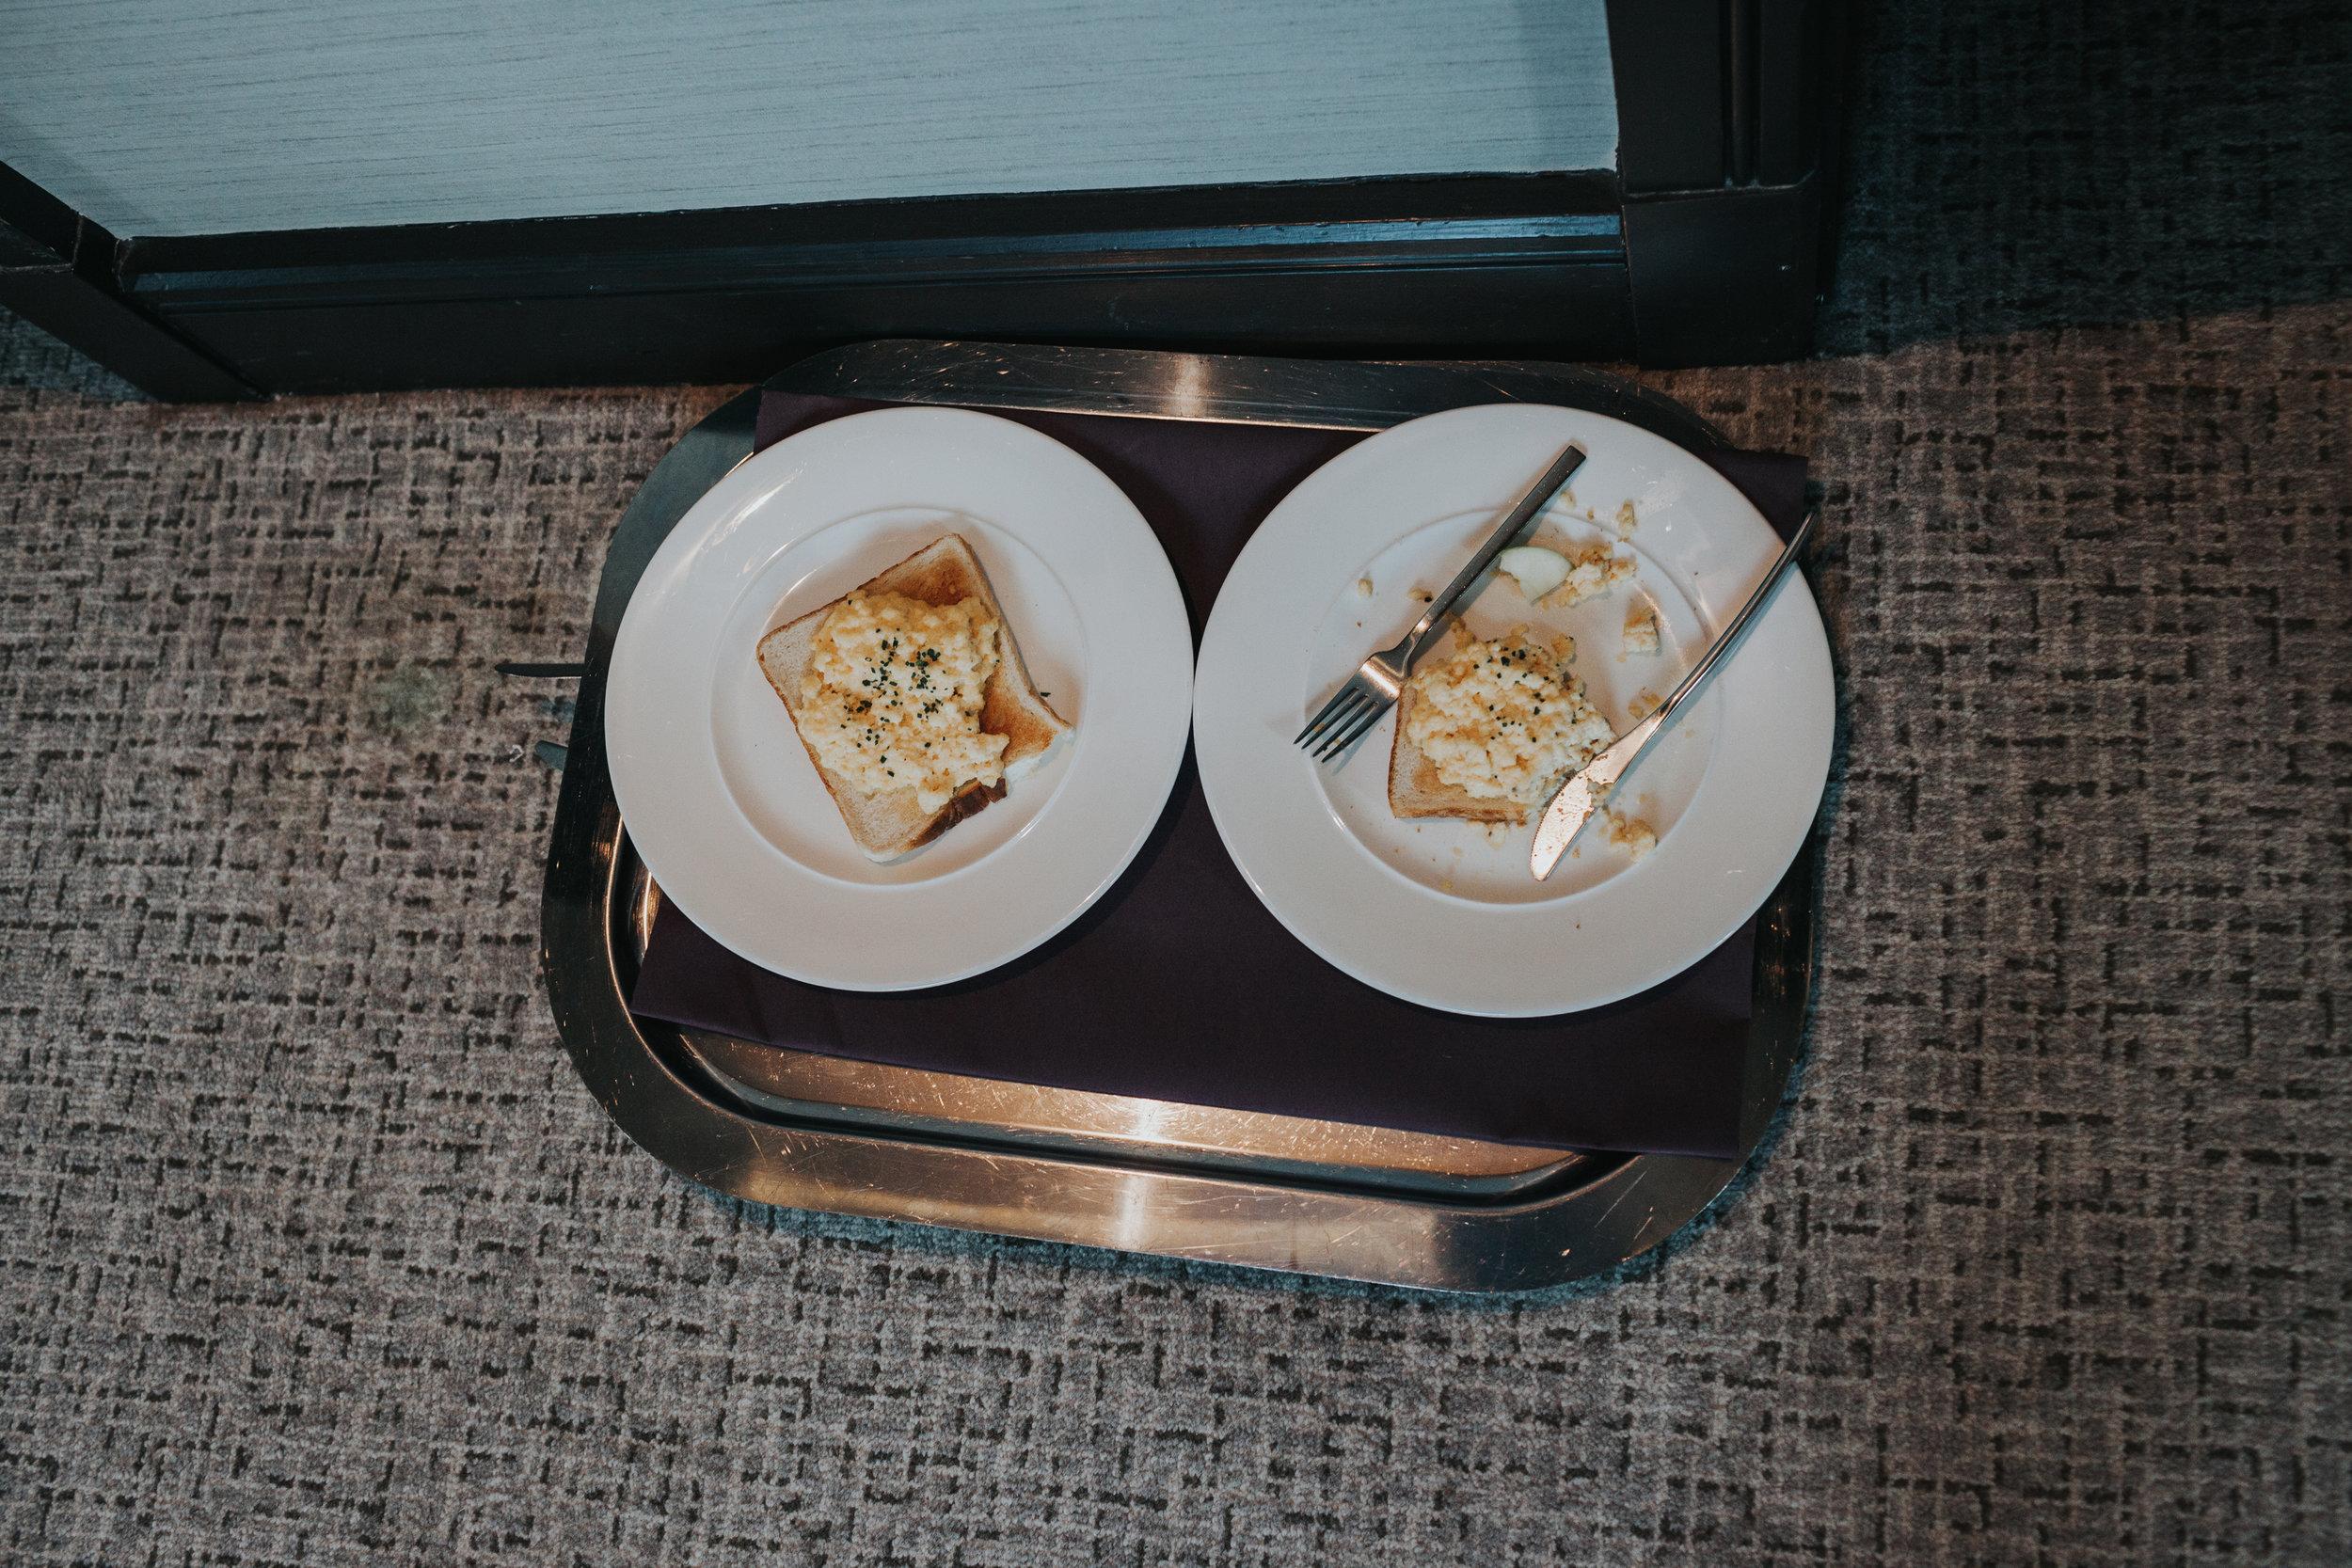 Scrambled eggs on toast.